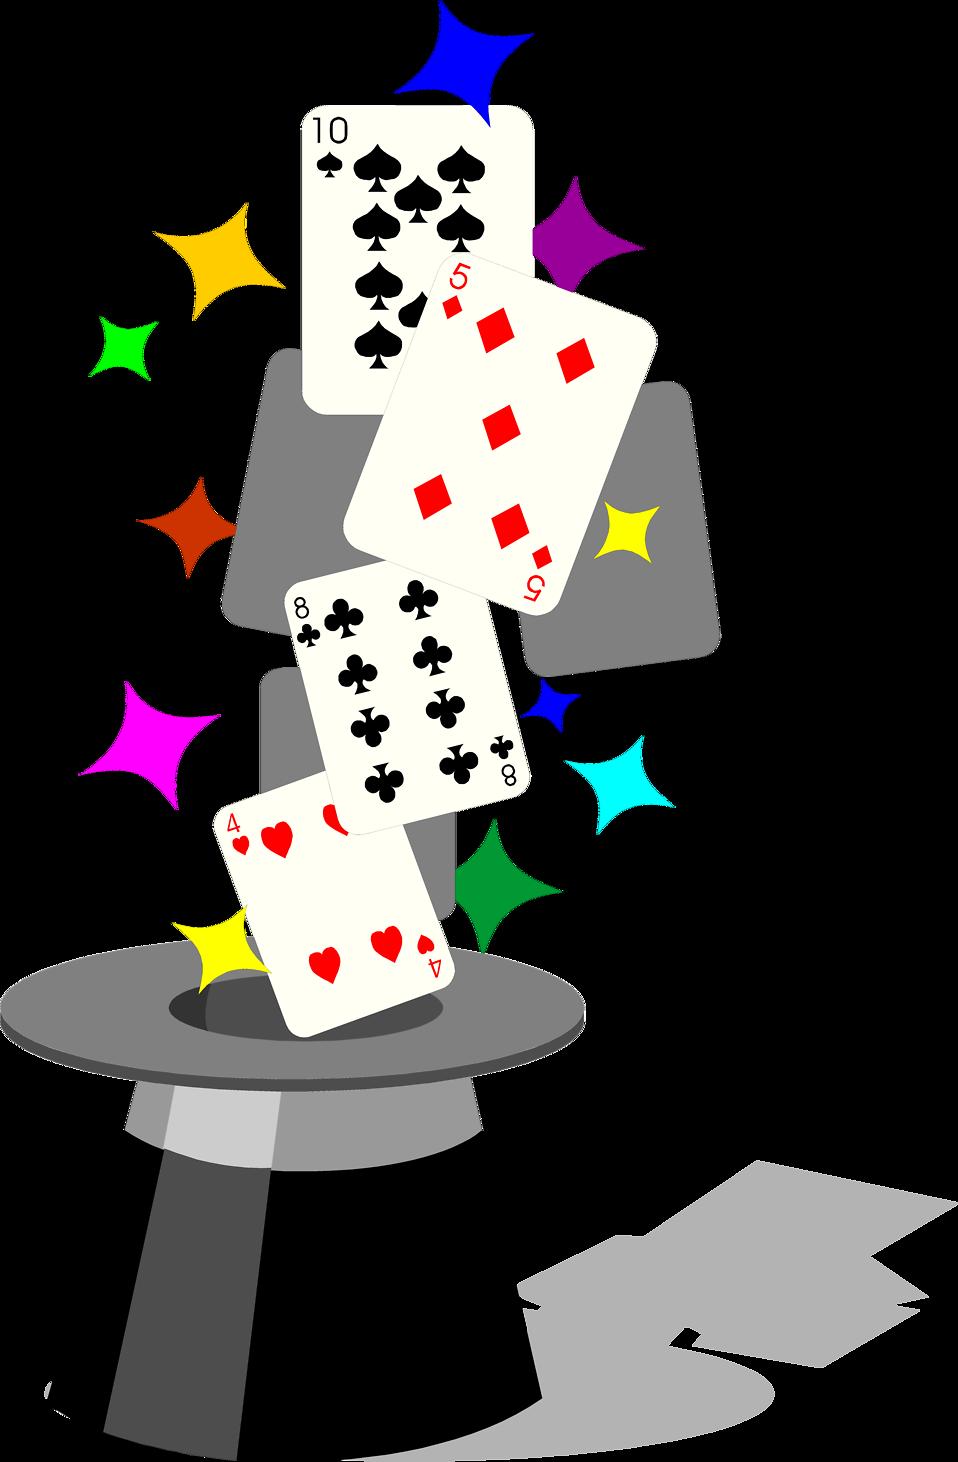 958x1462 Magic Free Stock Photo Illustration Of Playing Cardsnd